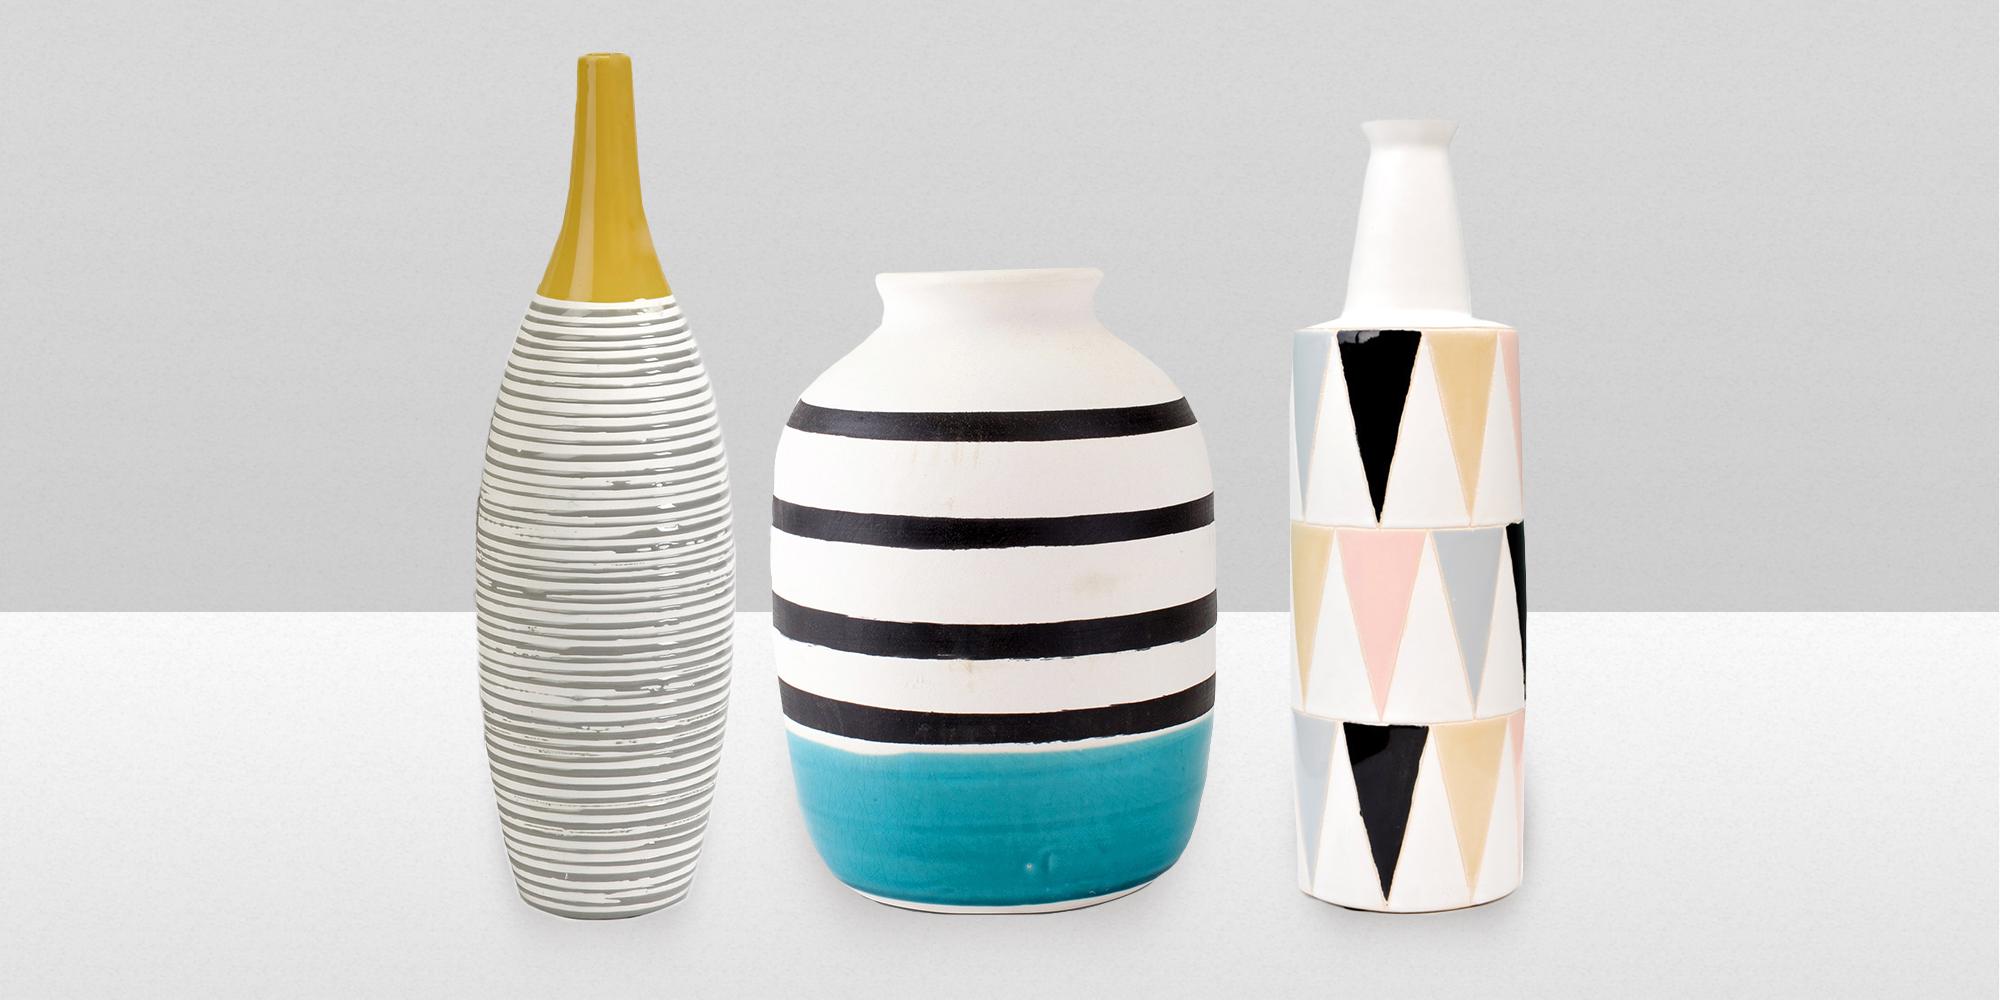 13 best ceramic vases in 2018 decorative ceramic flower for Decorative home products